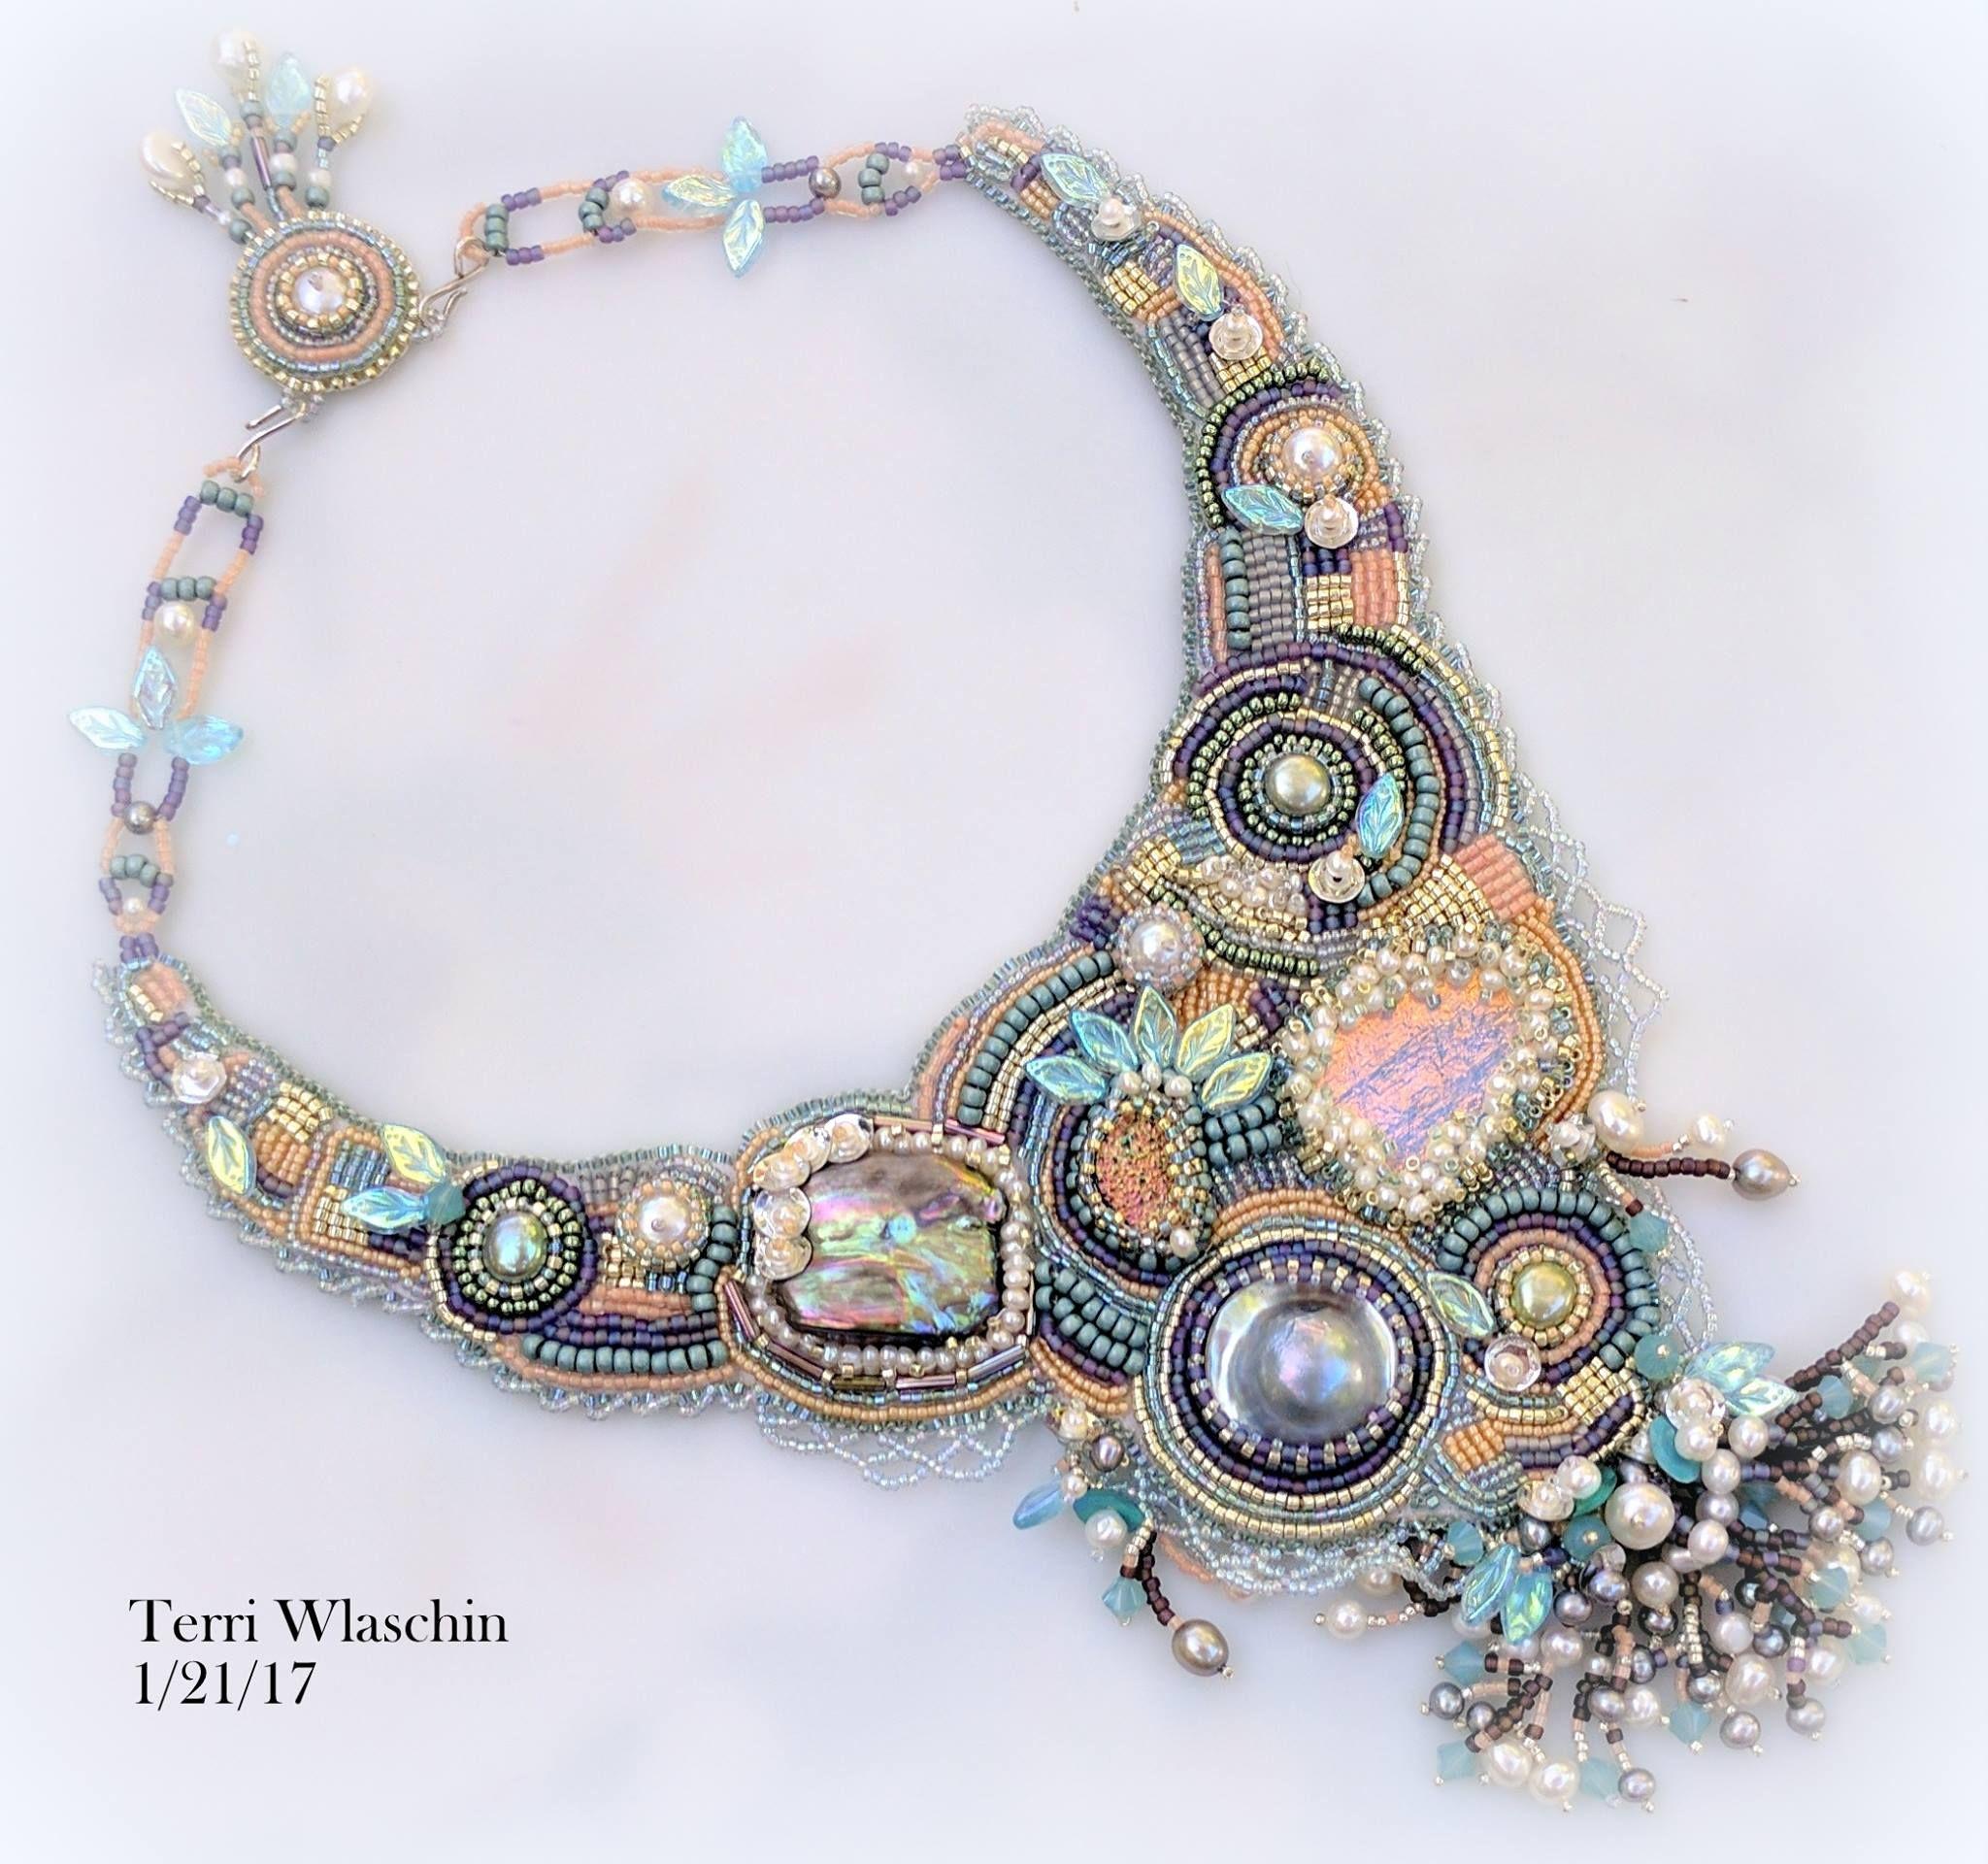 99b926cd94c Mermaid s tale of glory. Handmade Beaded Jewelry